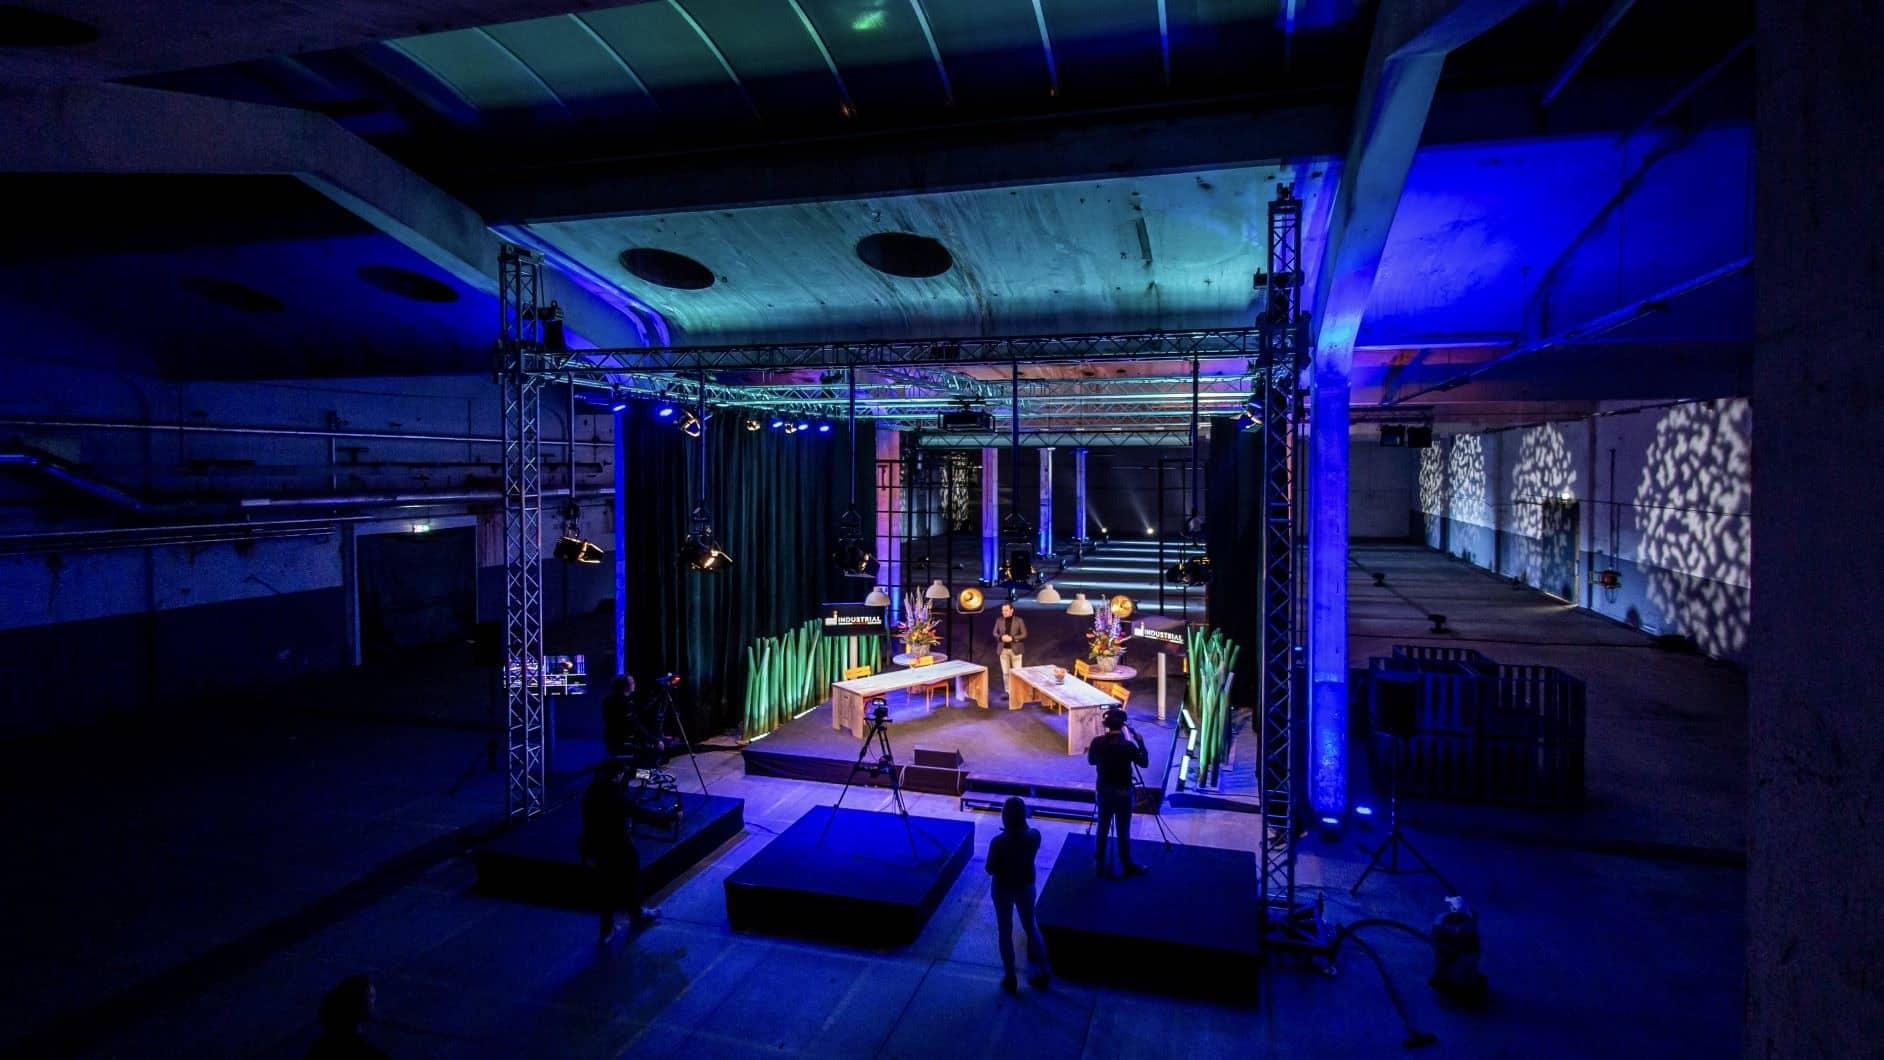 Industrial Studios - locatie - studio - online events - plug & play - Nightlife Productions - Mirage - Industriepark Kleefse Waard - Arnhem